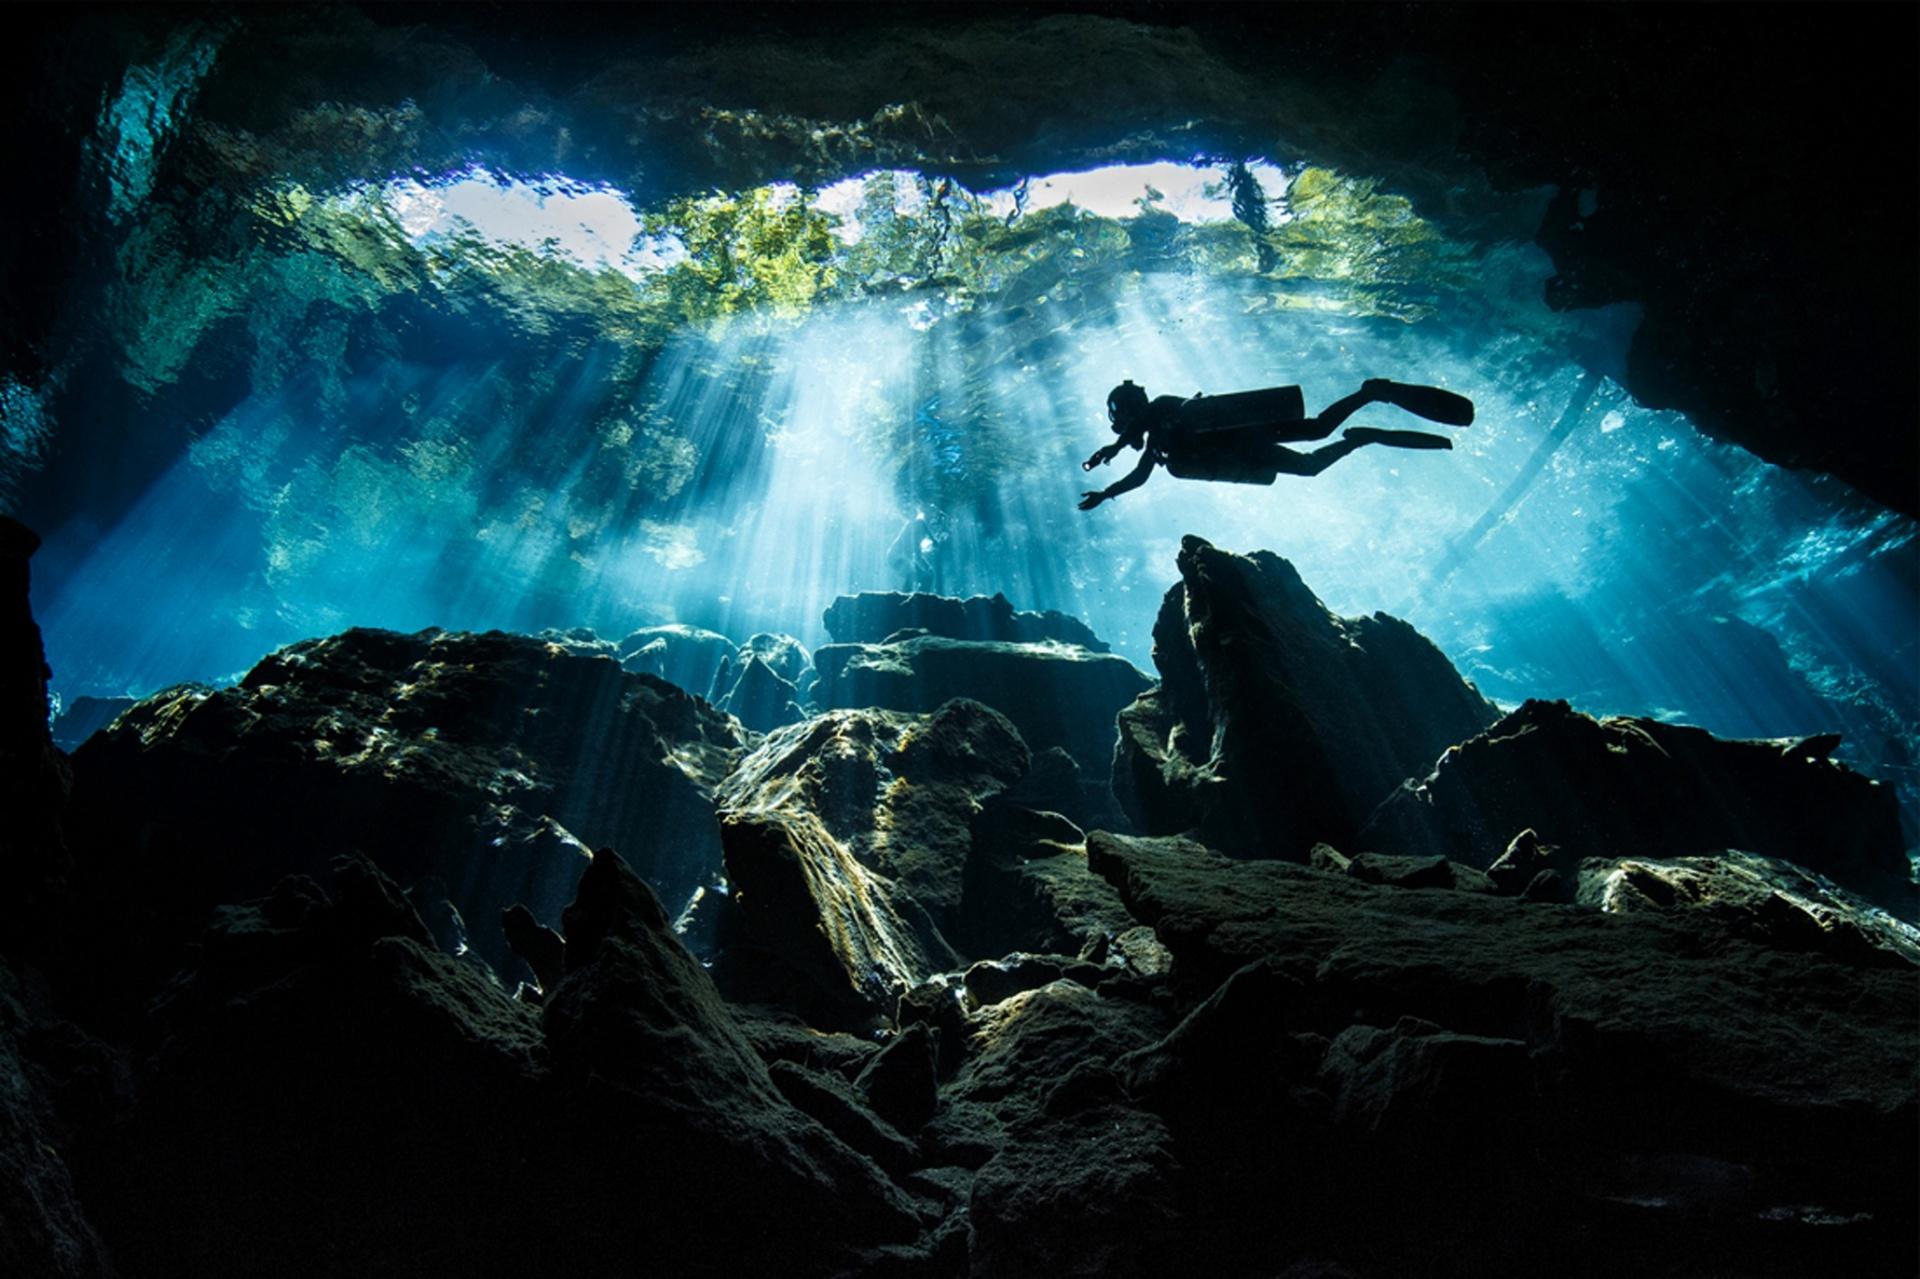 Spirit of Adventure runner-up, Terry Steeley, UK Kulkulkan Cenote, Riveria Maya, Mexico Photograph: Terry Steeley/TPOTY